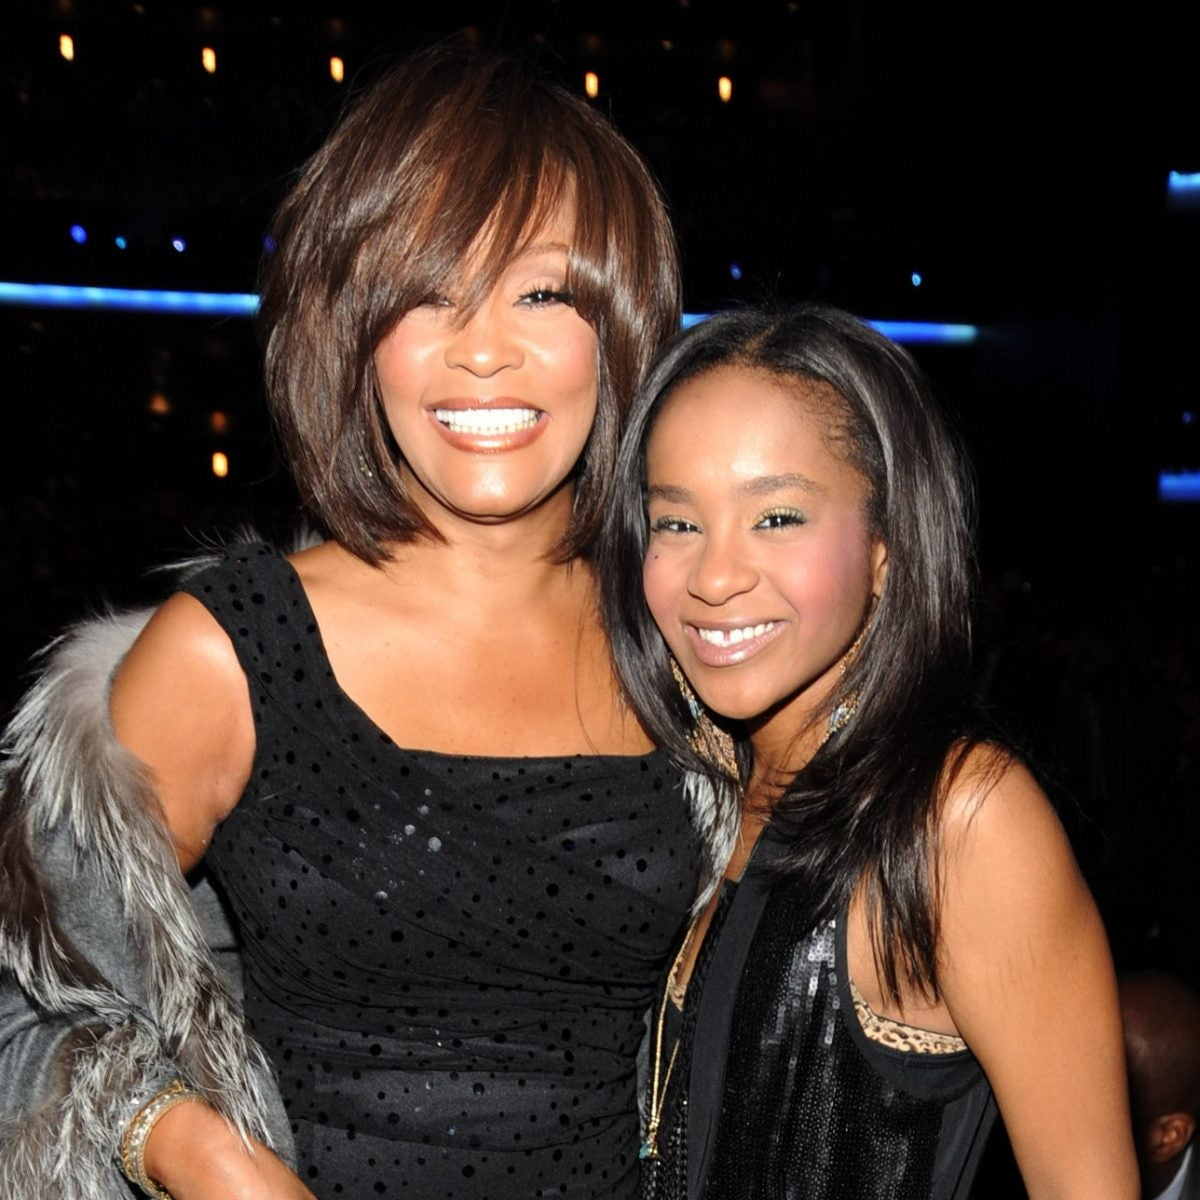 Watch The Trailer For Lifetime's Whitney Houston And Bobbi Kristina Documentary